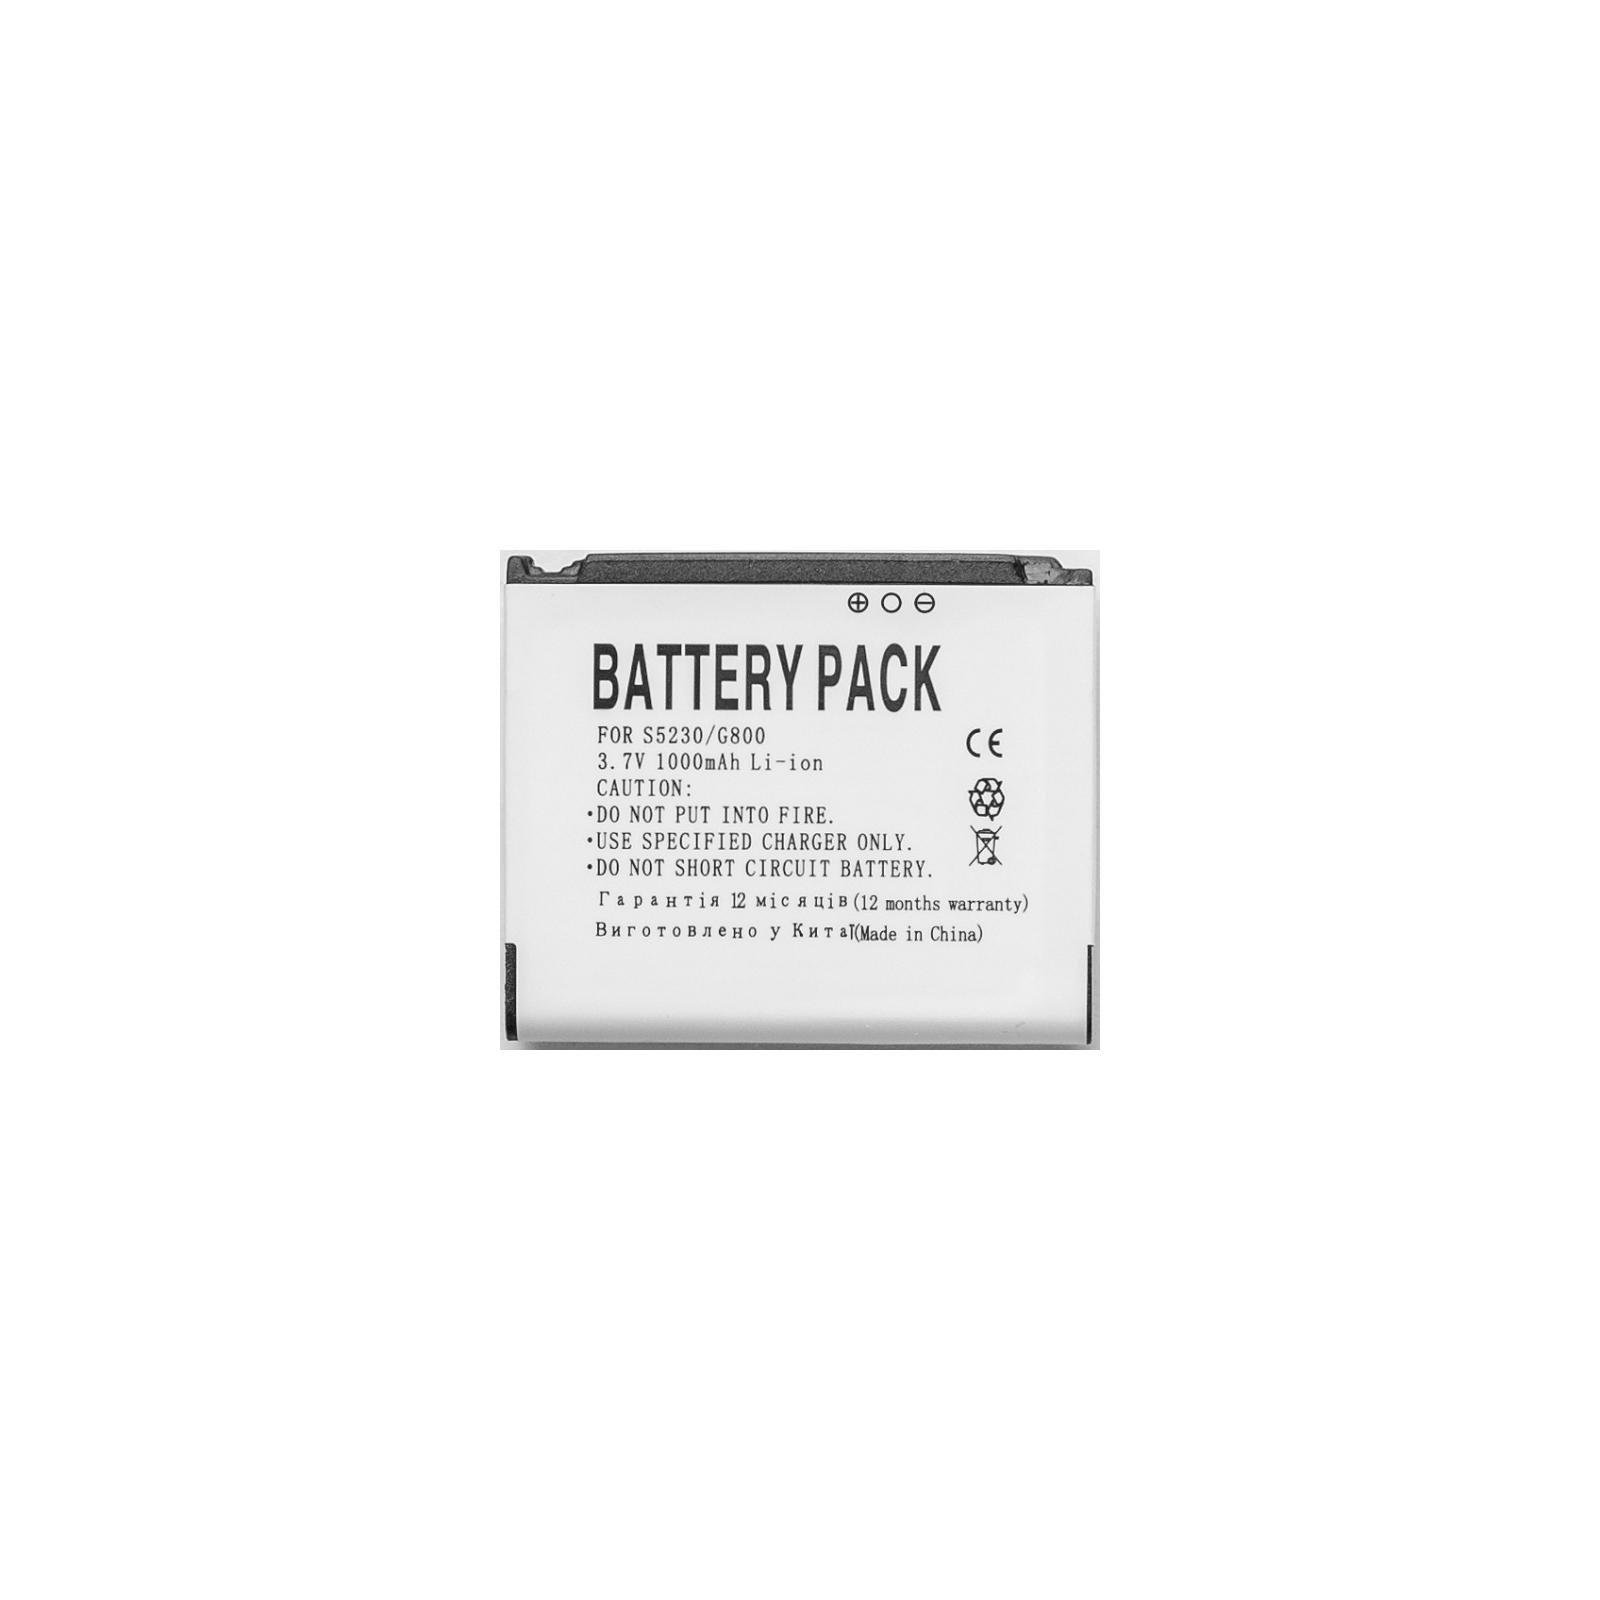 Аккумуляторная батарея PowerPlant Samsung G808, G800, S5230, L870, S7520U |AB603443CU| (DV00DV6101) изображение 2